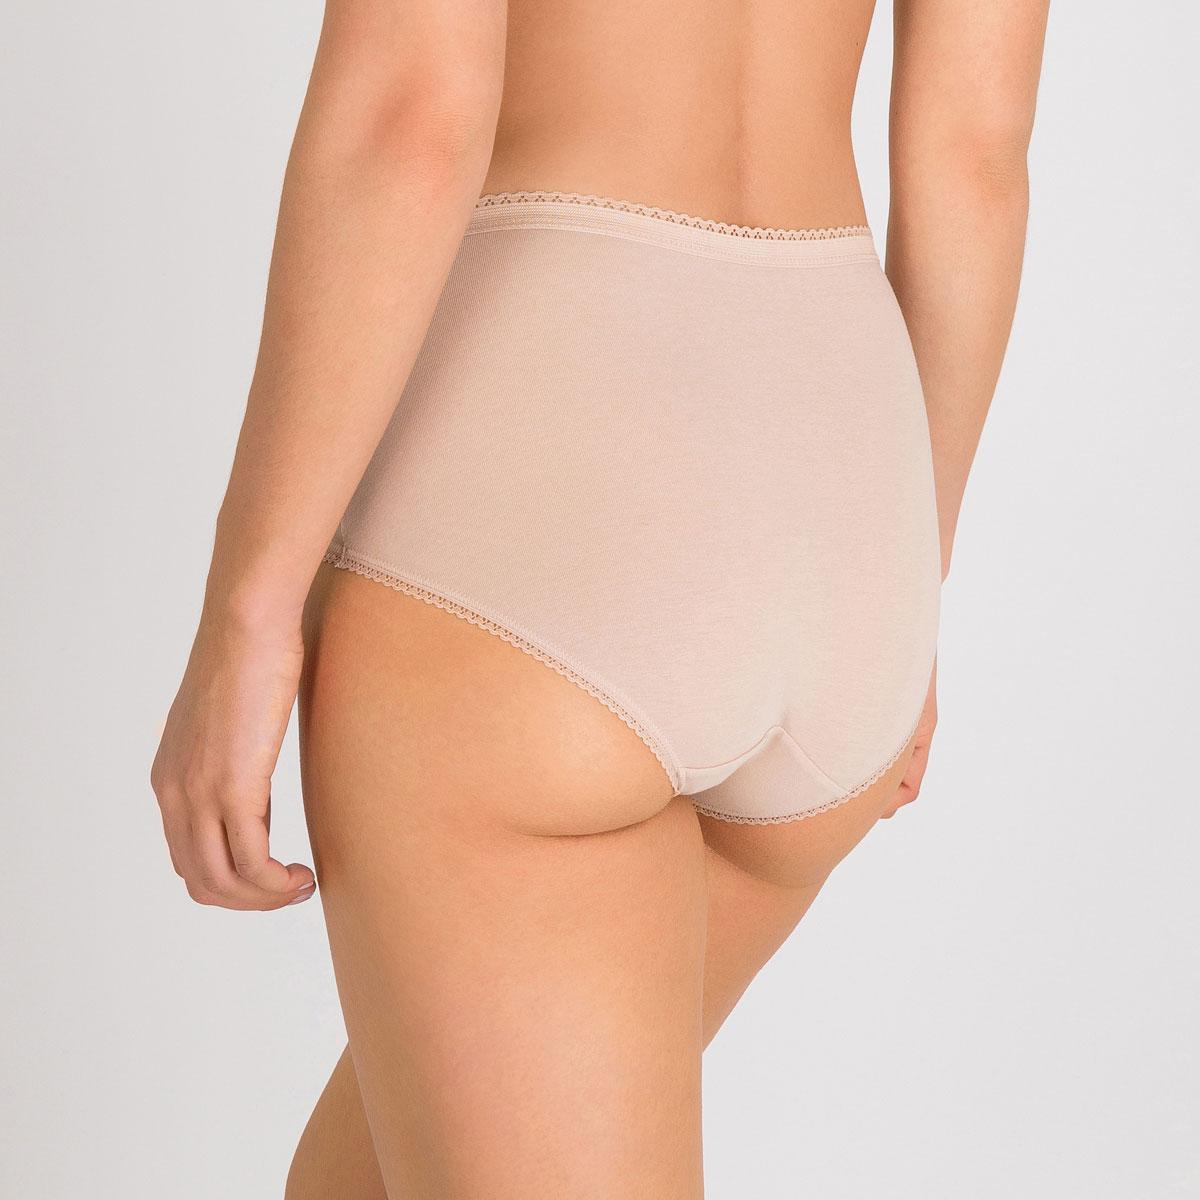 3 culottes Midi noire, blanche et beige - Coton Stretch-PLAYTEX